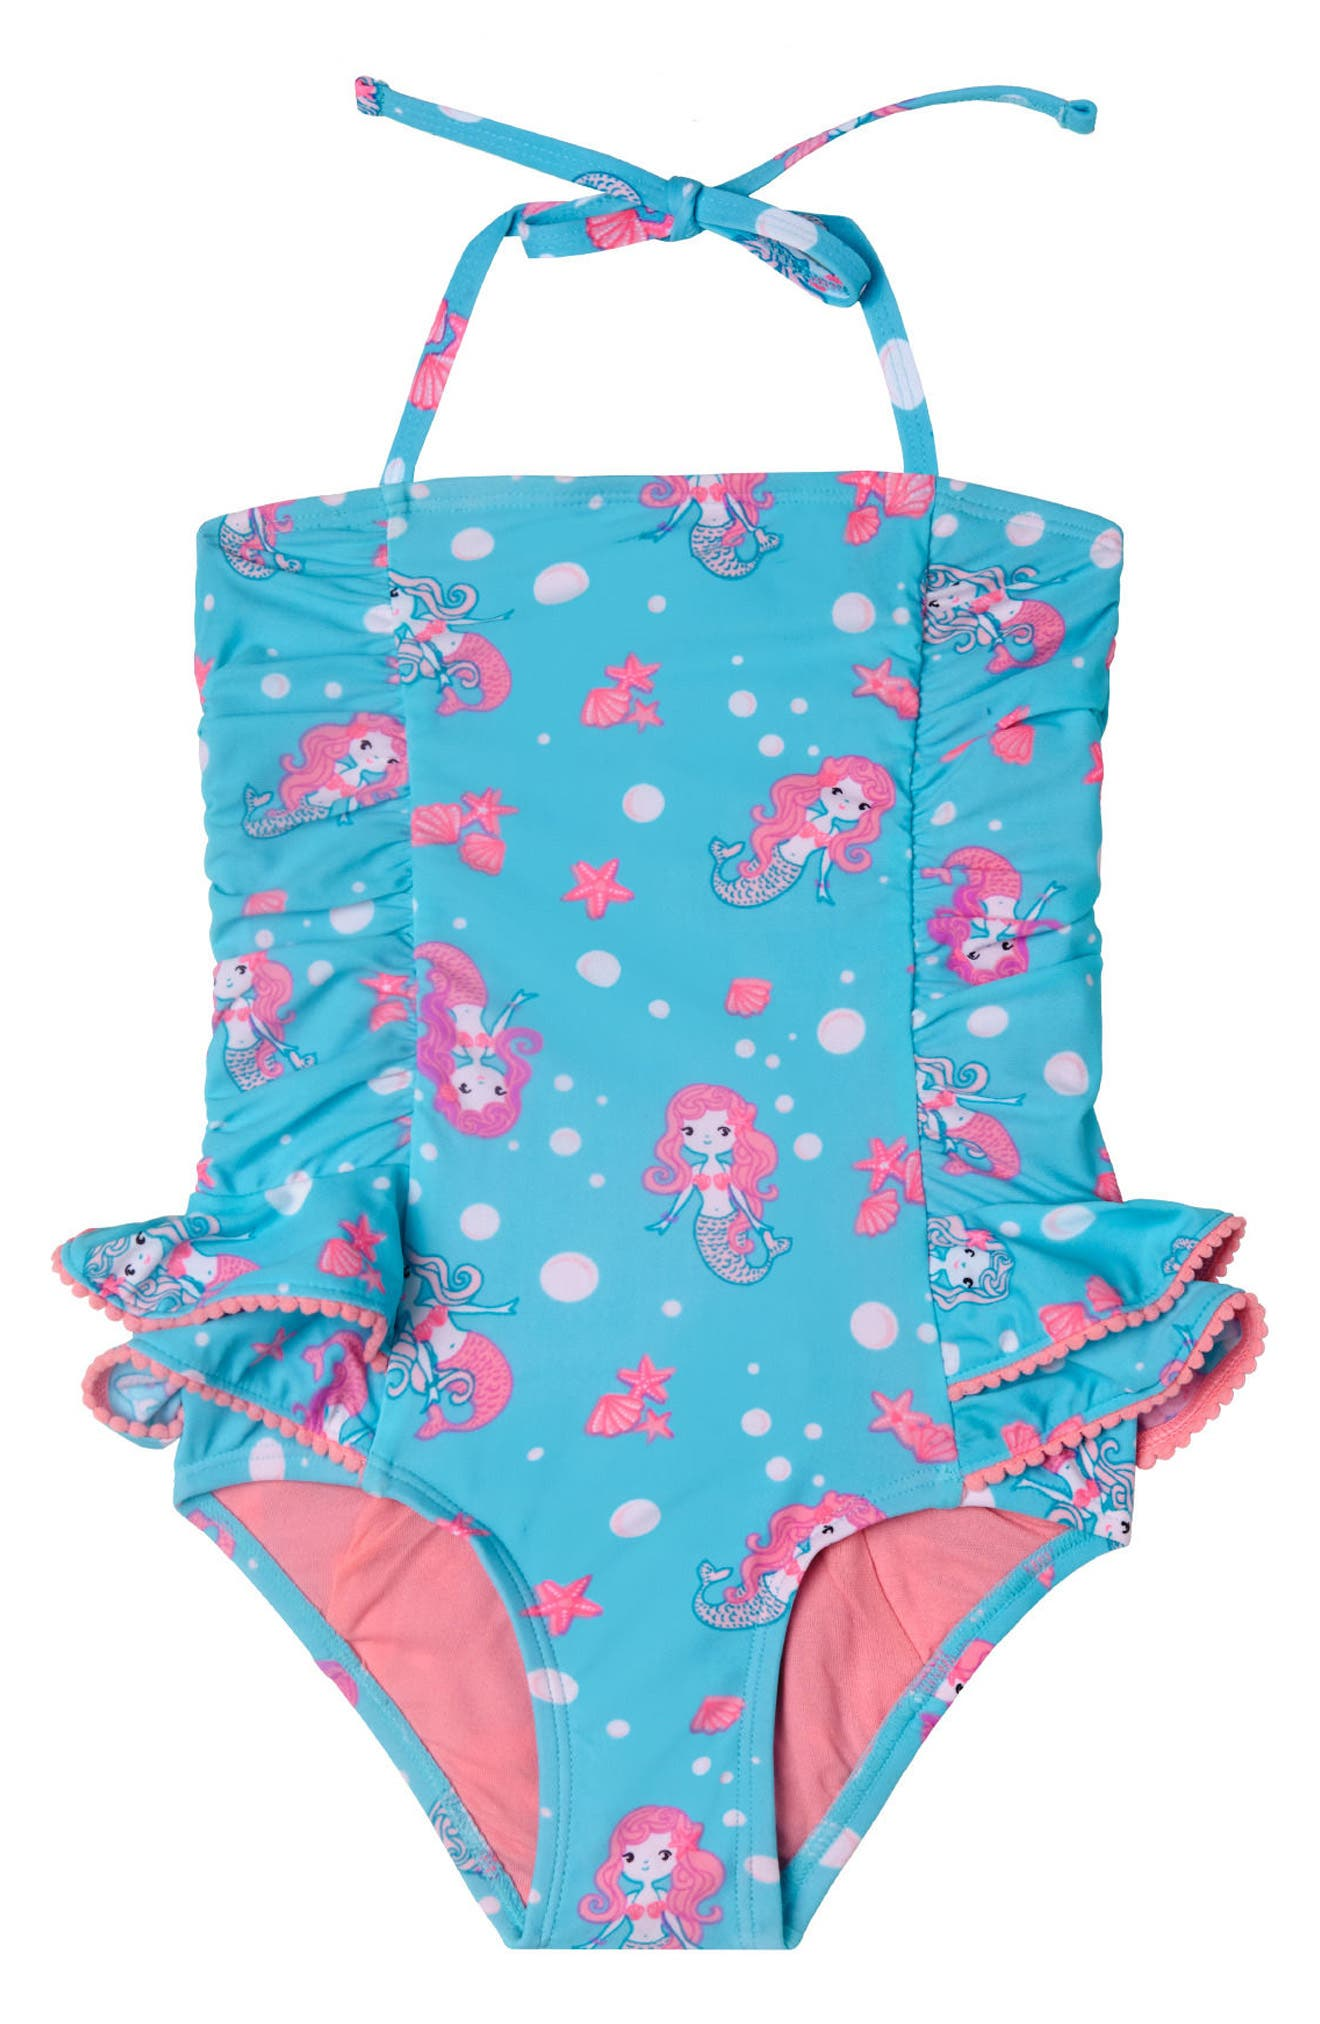 Mermaid Crush One-Piece Swimsuit,                             Main thumbnail 1, color,                             Aqua